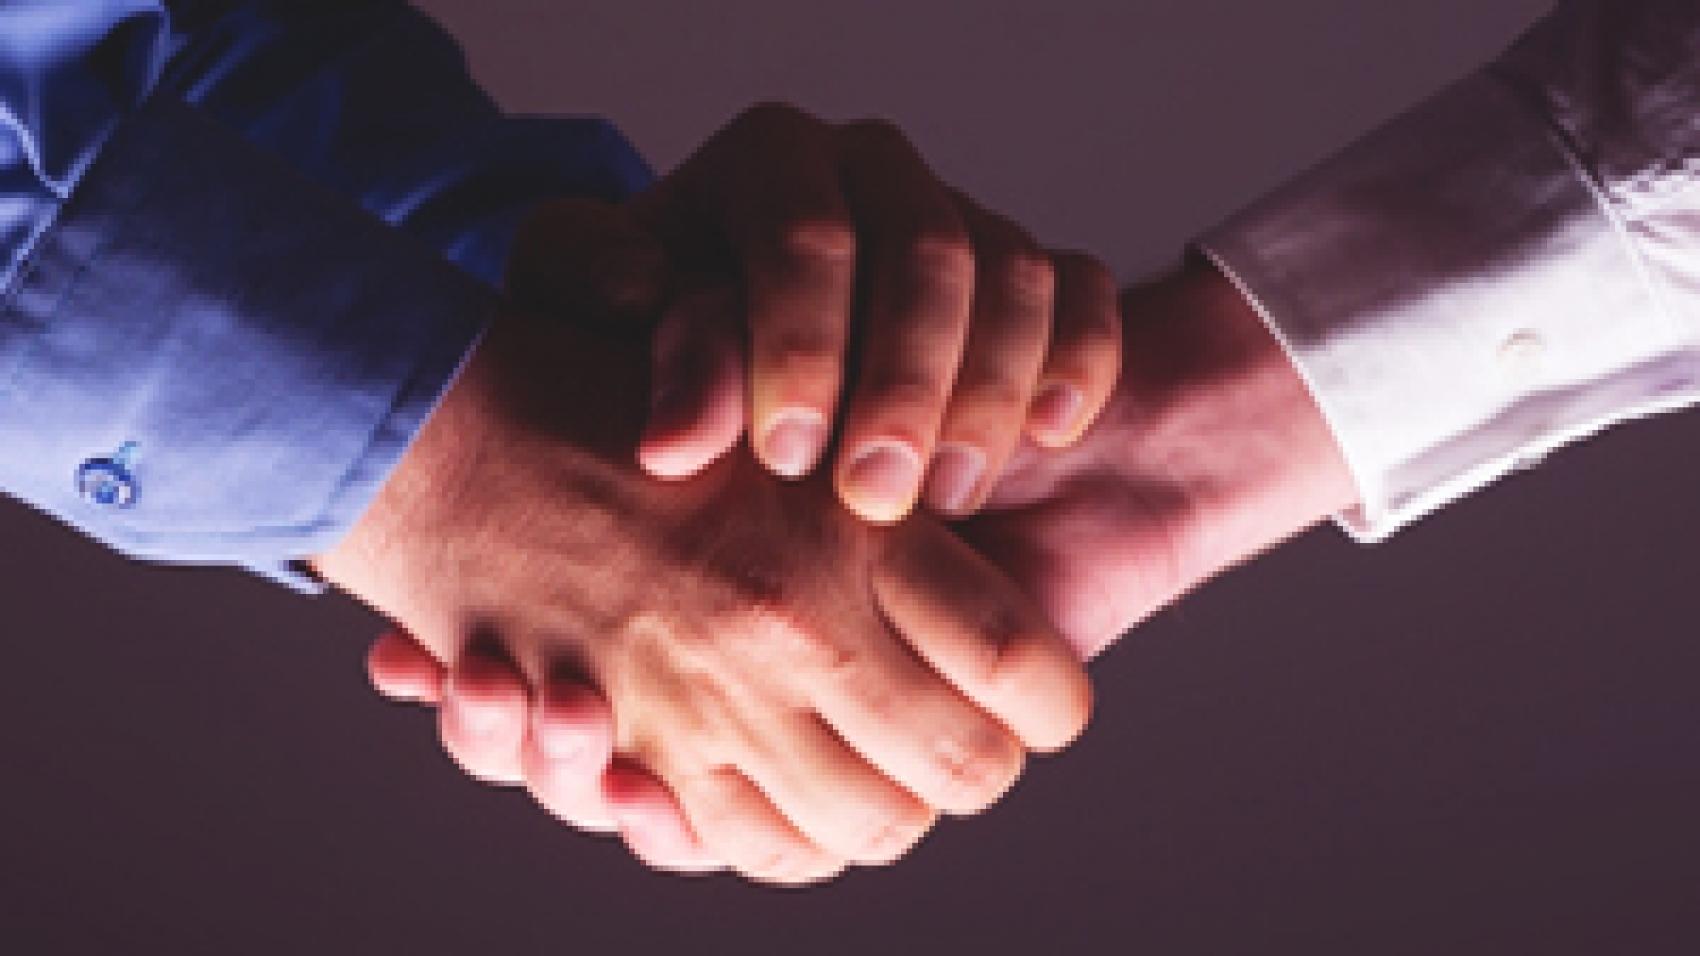 outsourcing partner shaking hands